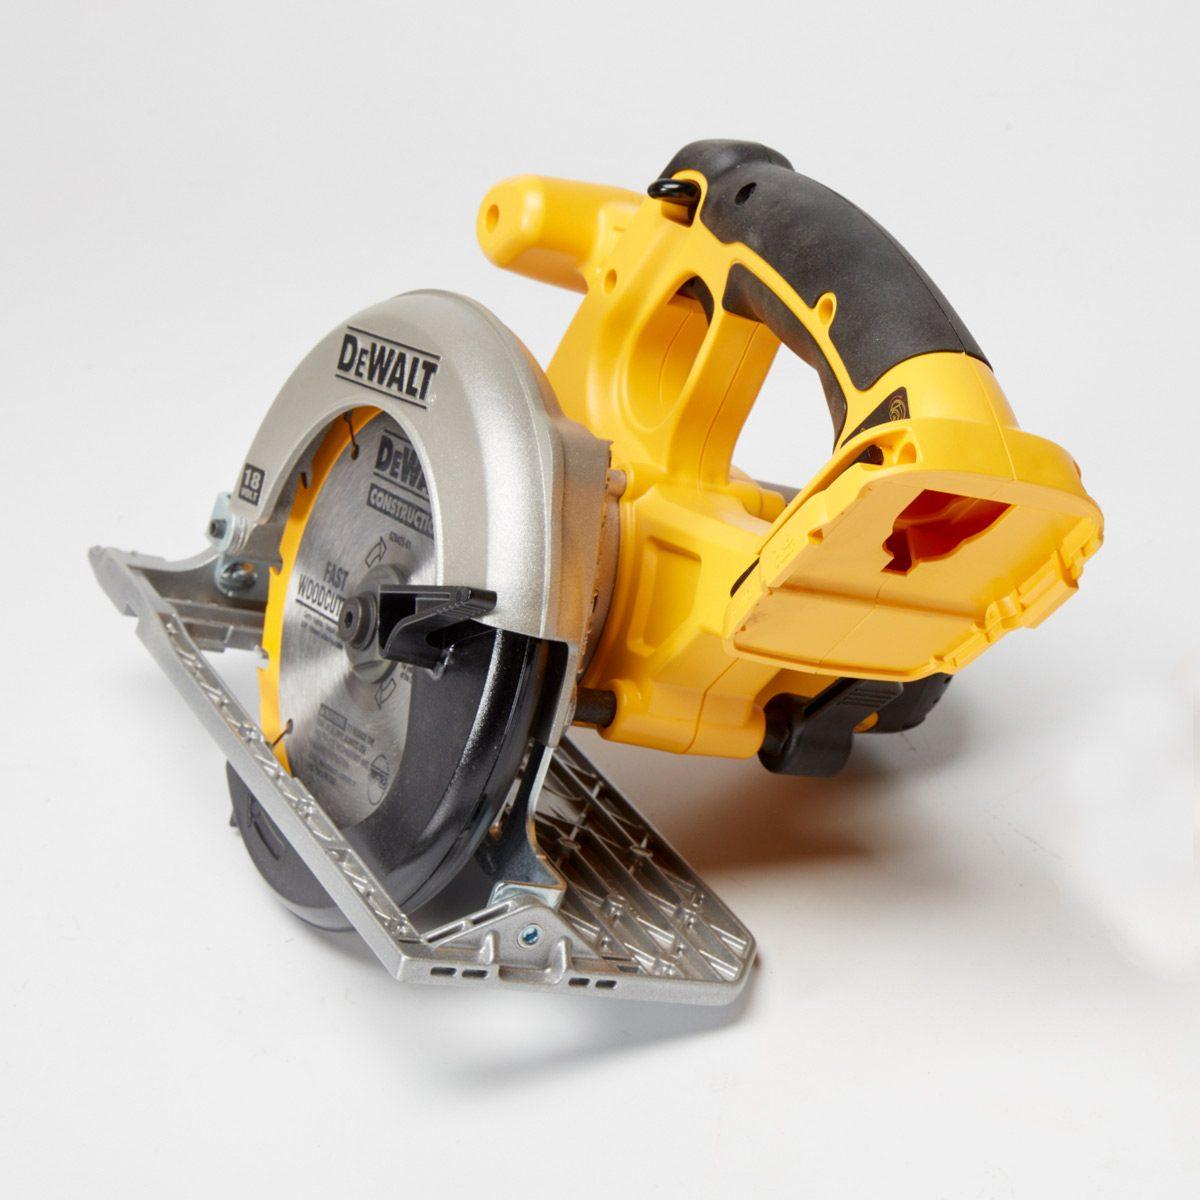 FH18DJF_583_52_002 Cordless Circular Saw